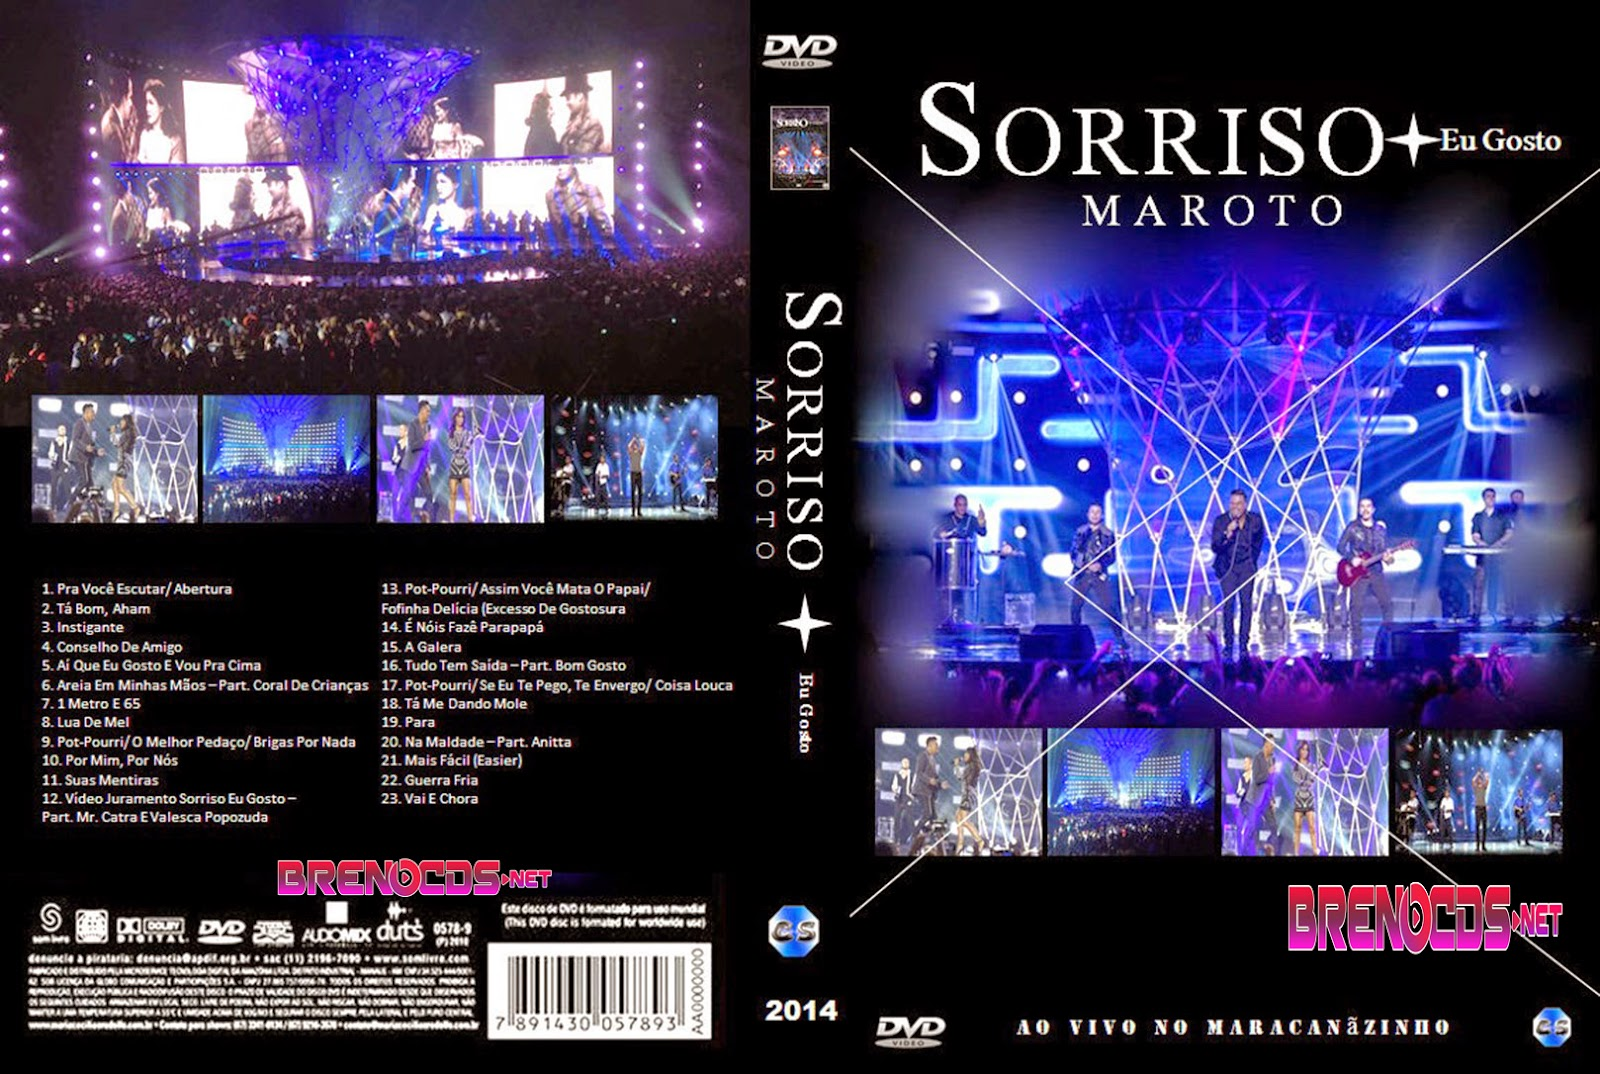 Arquivos maroto xandao download™.